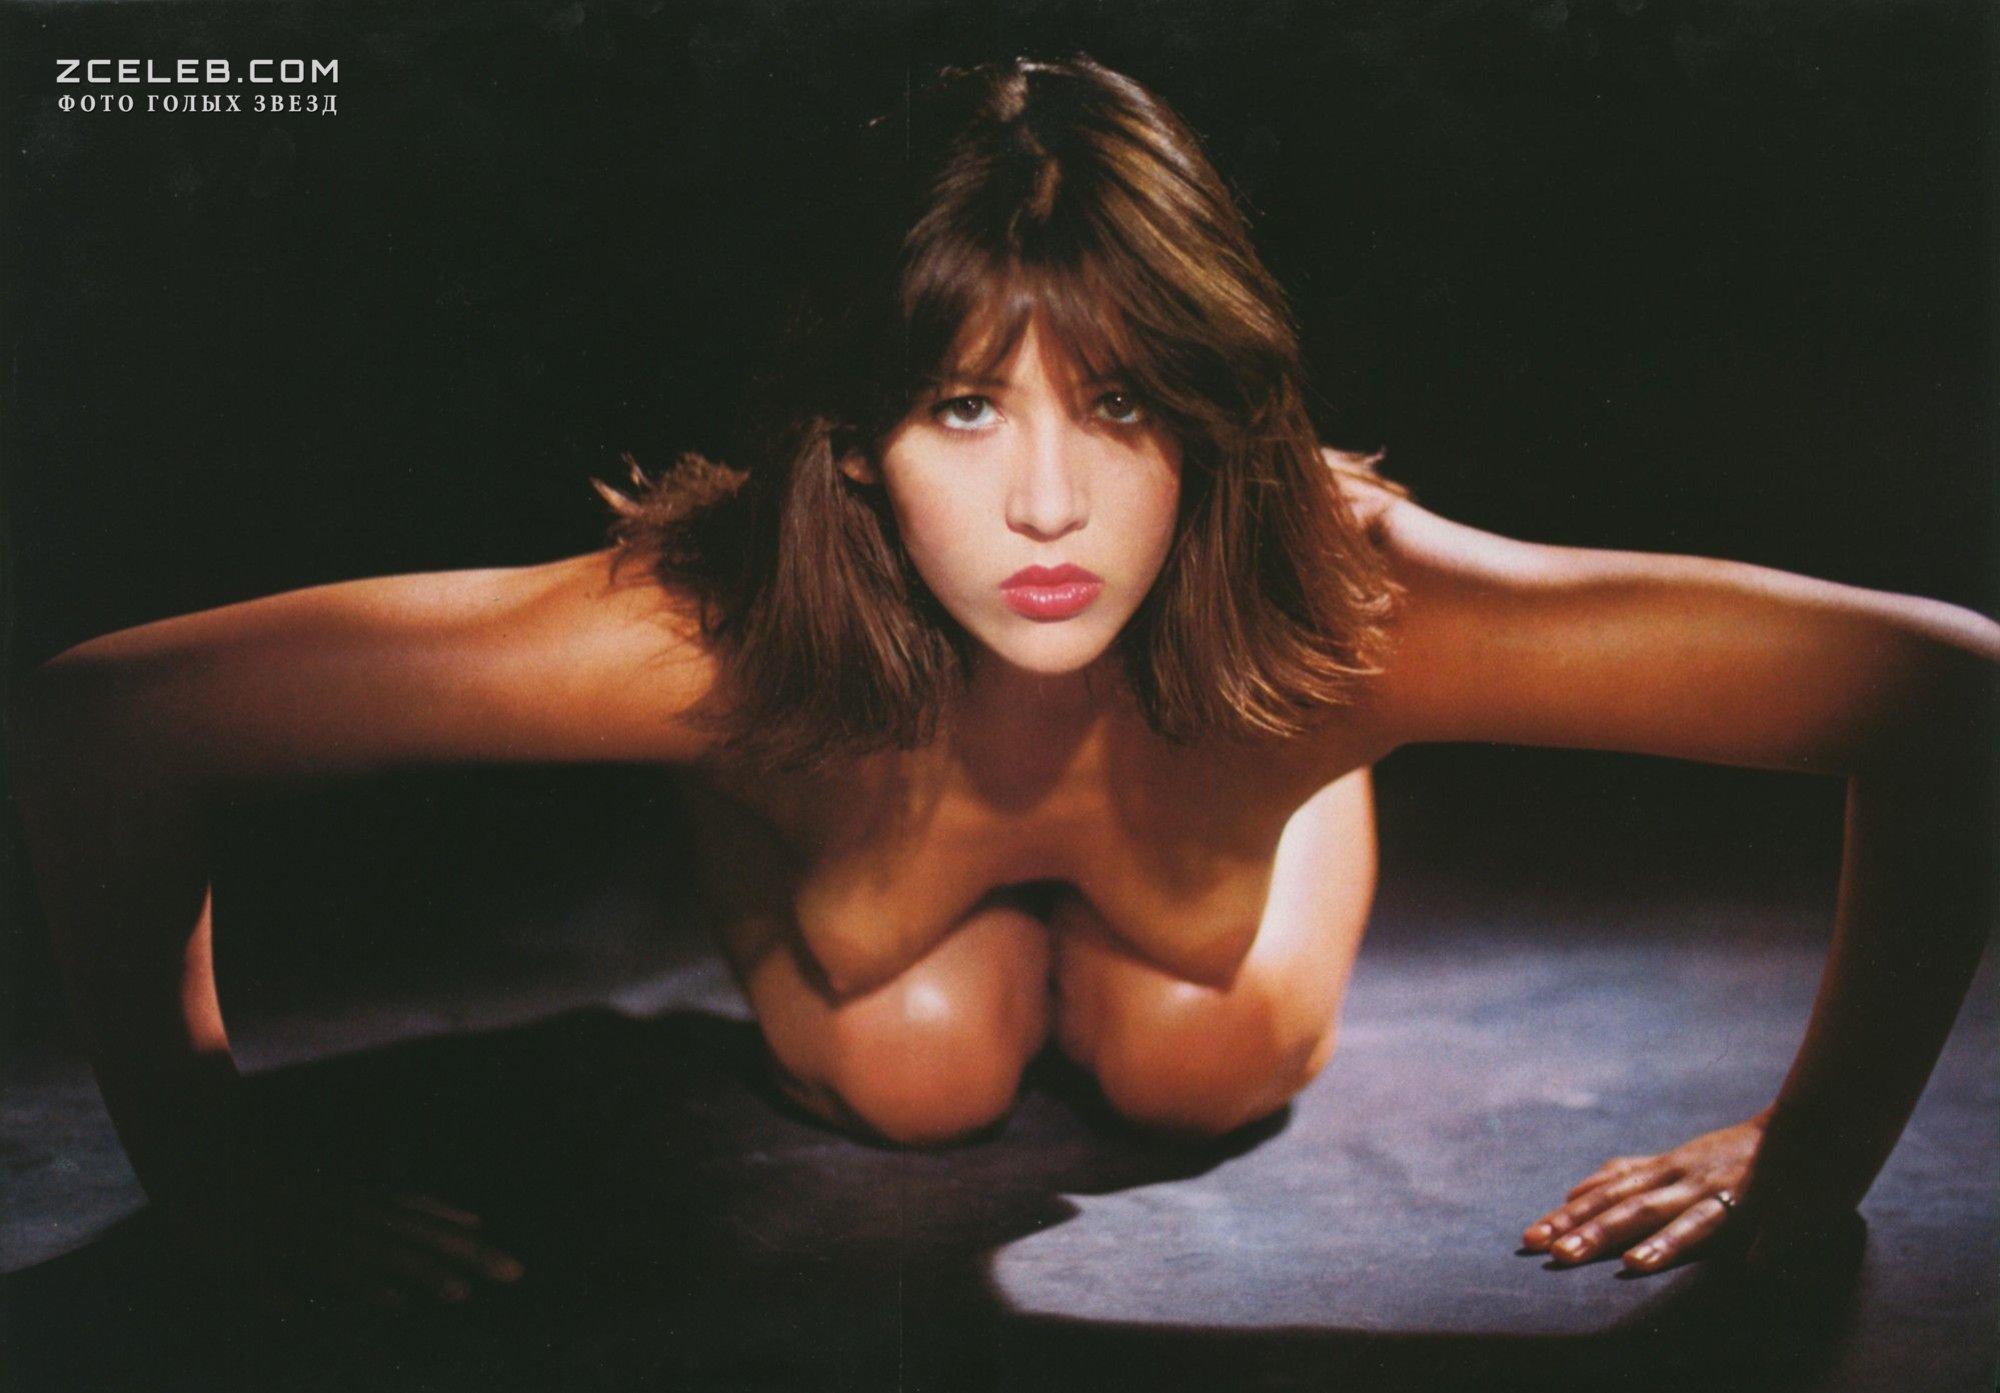 porno-foto-eroticheskie-filmi-s-izvestnimi-aktrisami-zvezdami